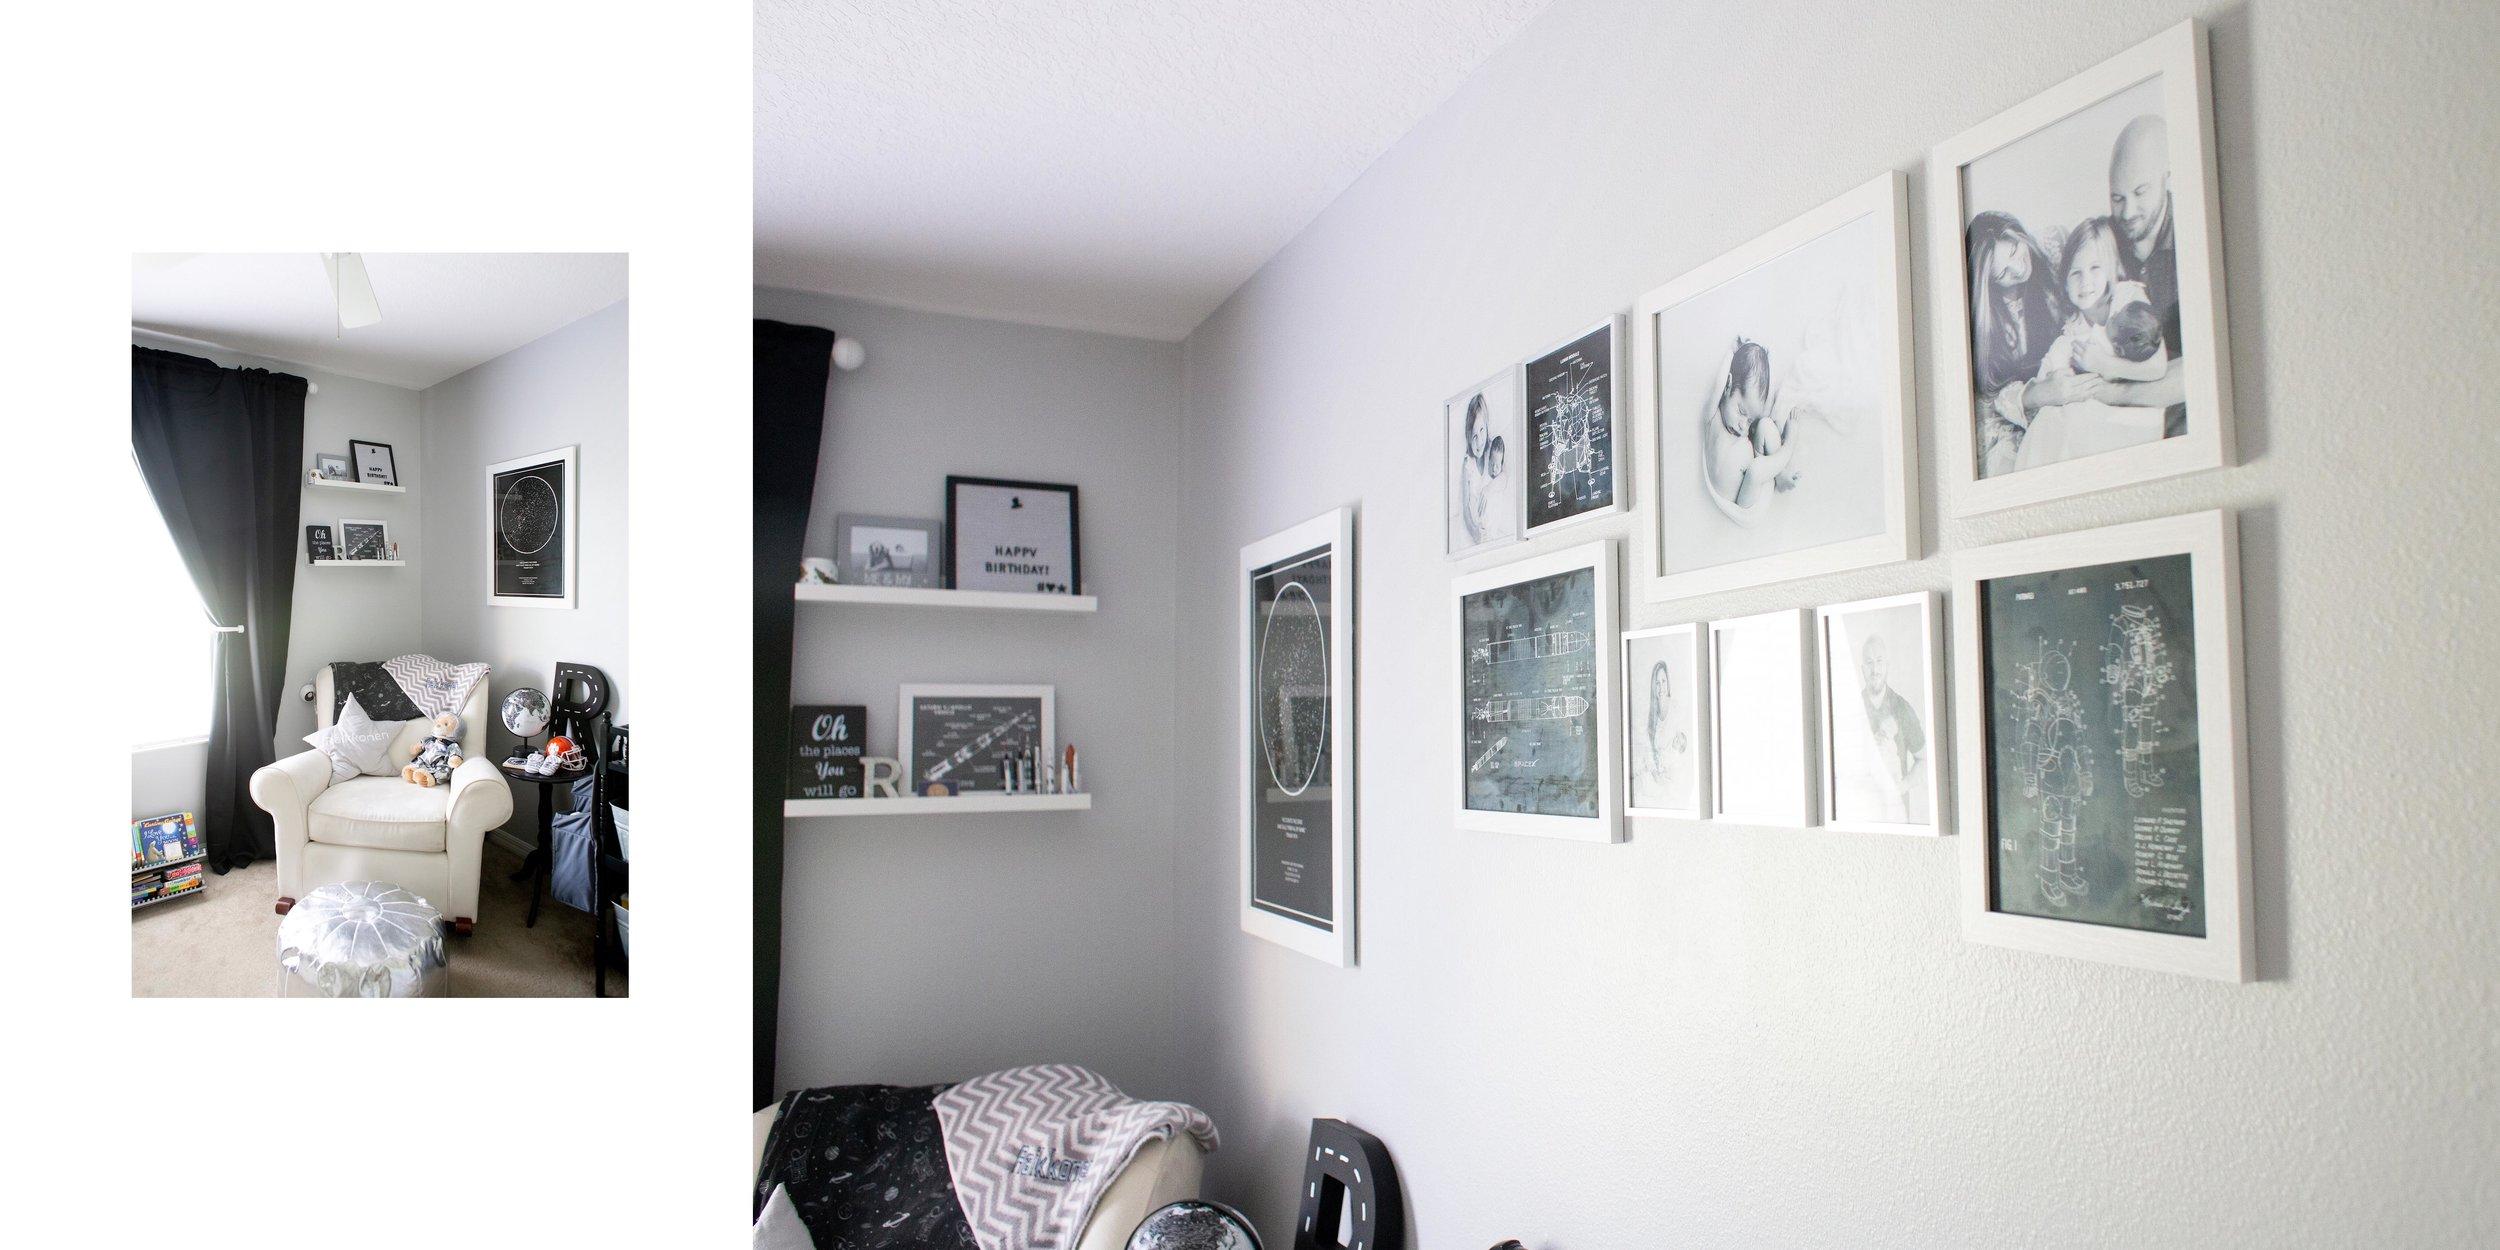 Raikkonen's_room_08.jpg